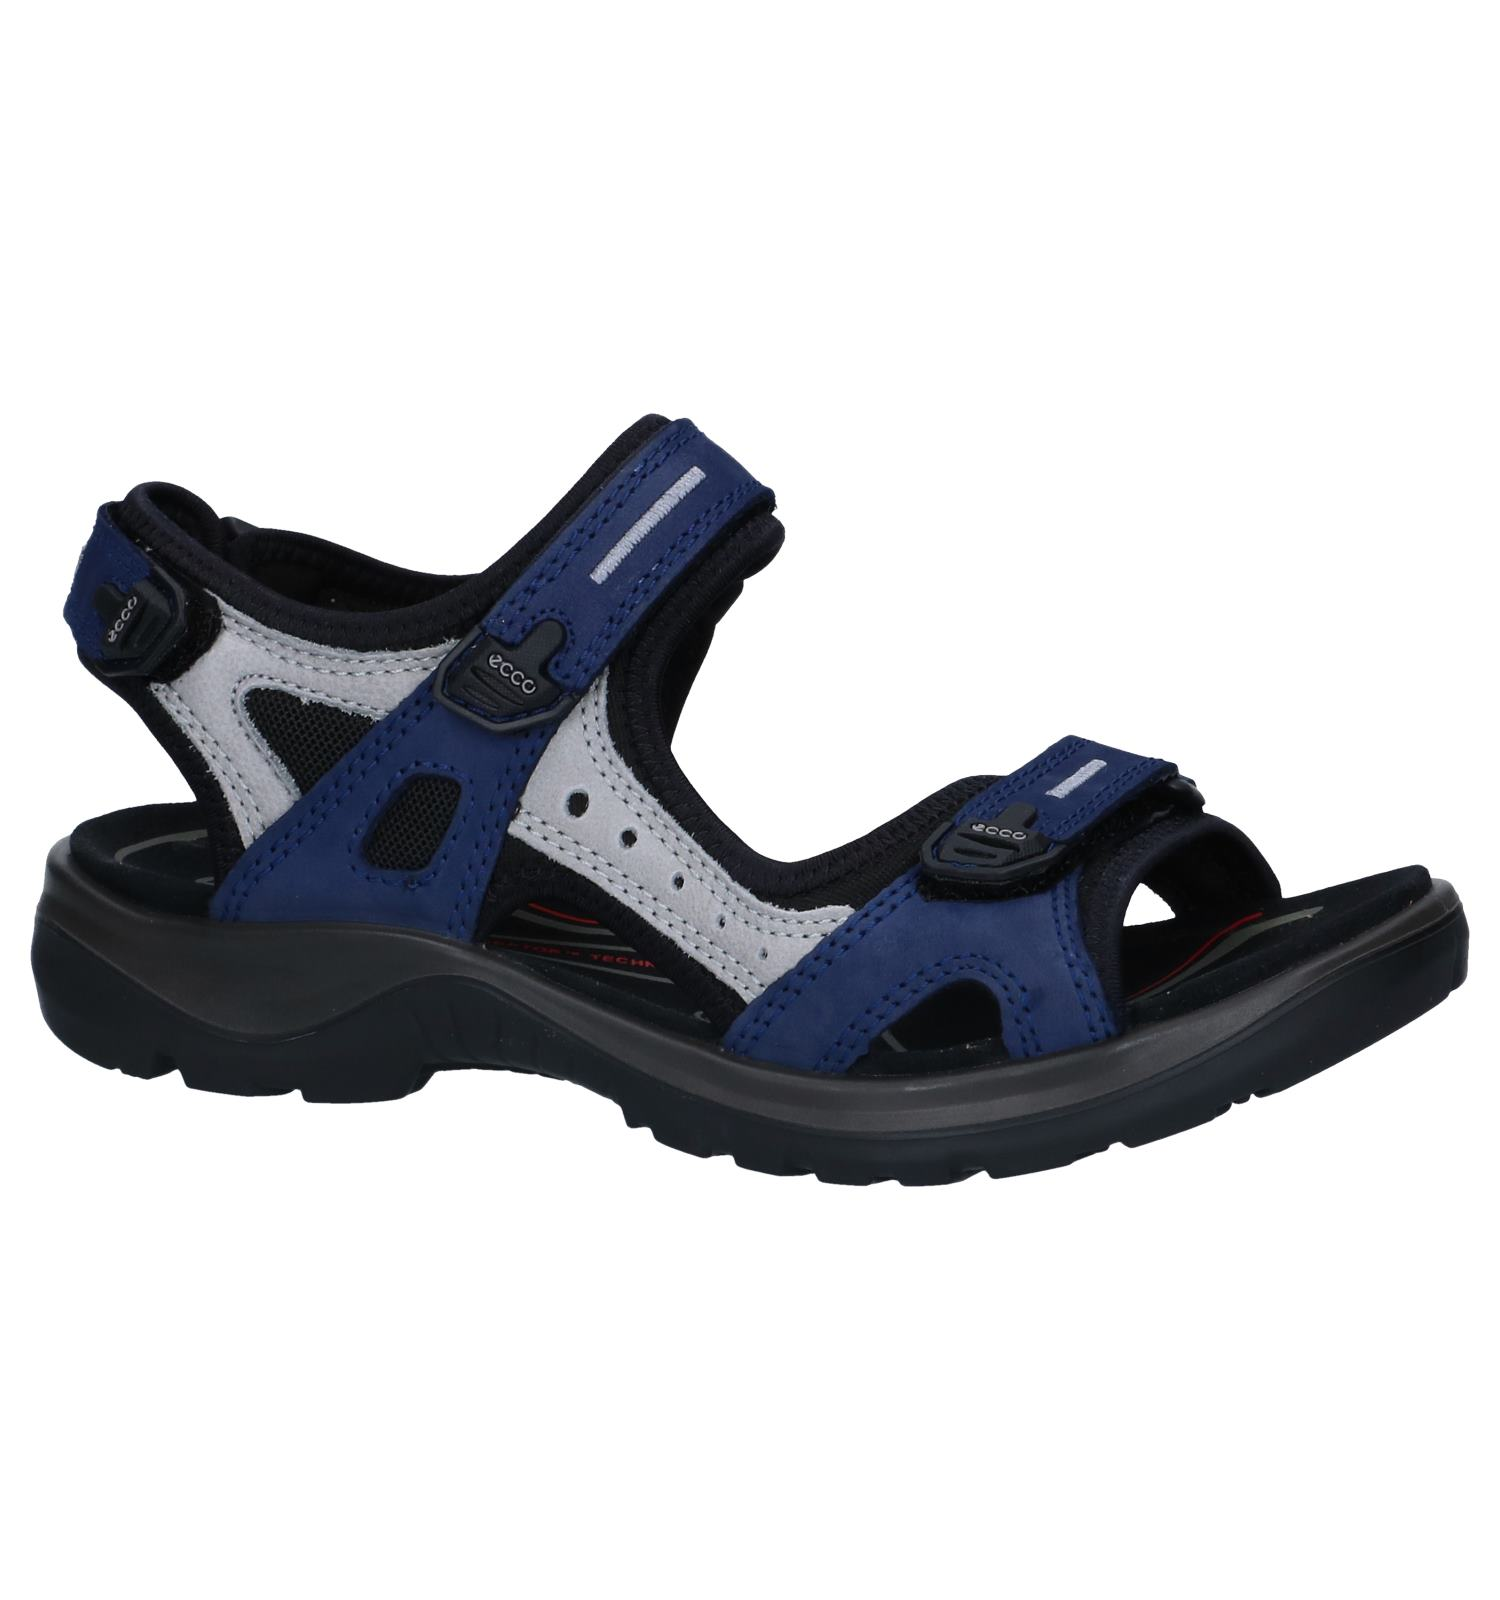 ECCO Offroad dames sandaal Blauw Maat 38